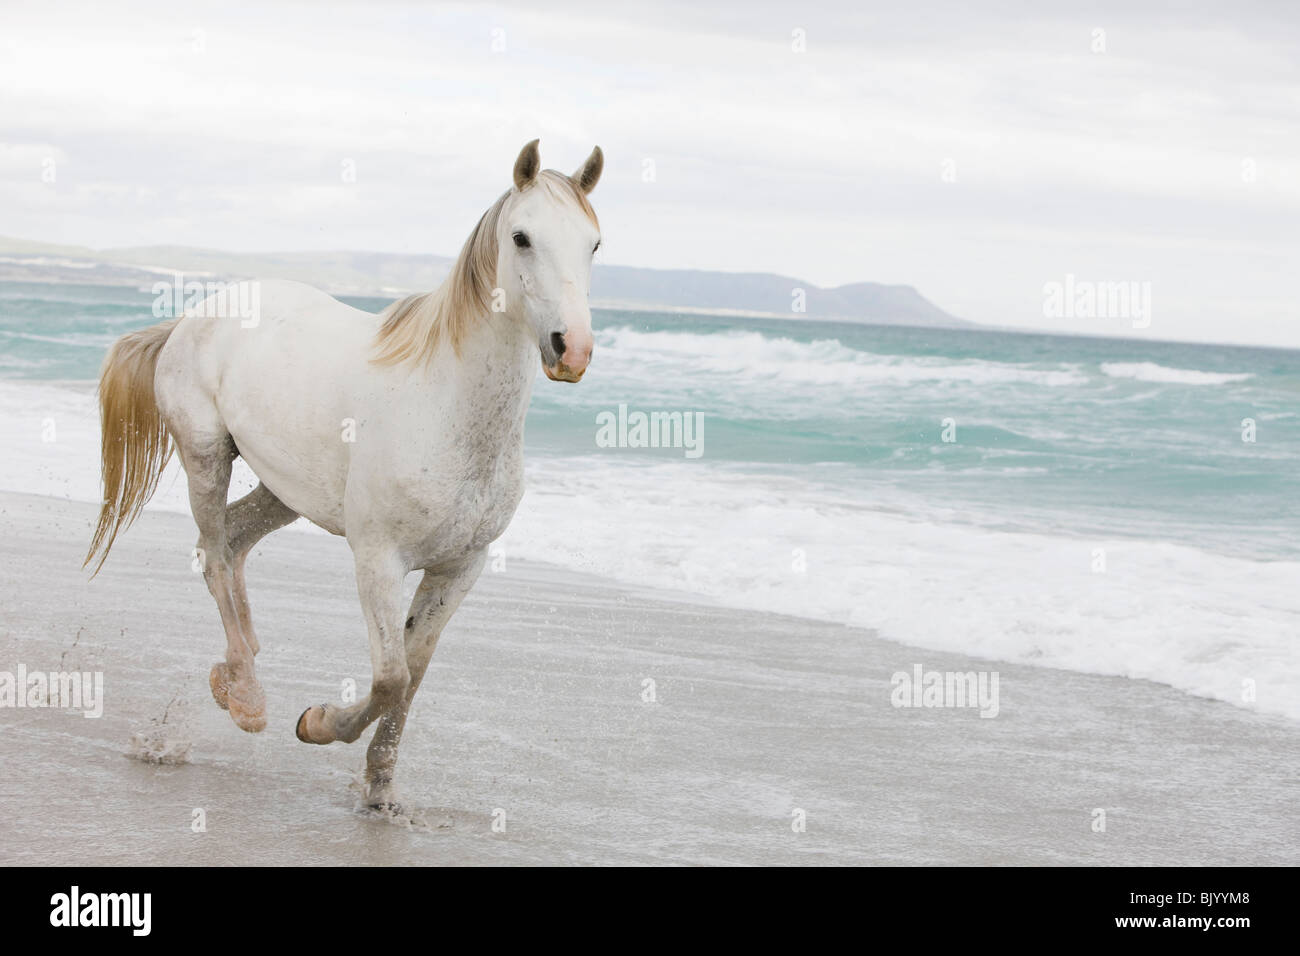 Horses on the beach - Stock Image